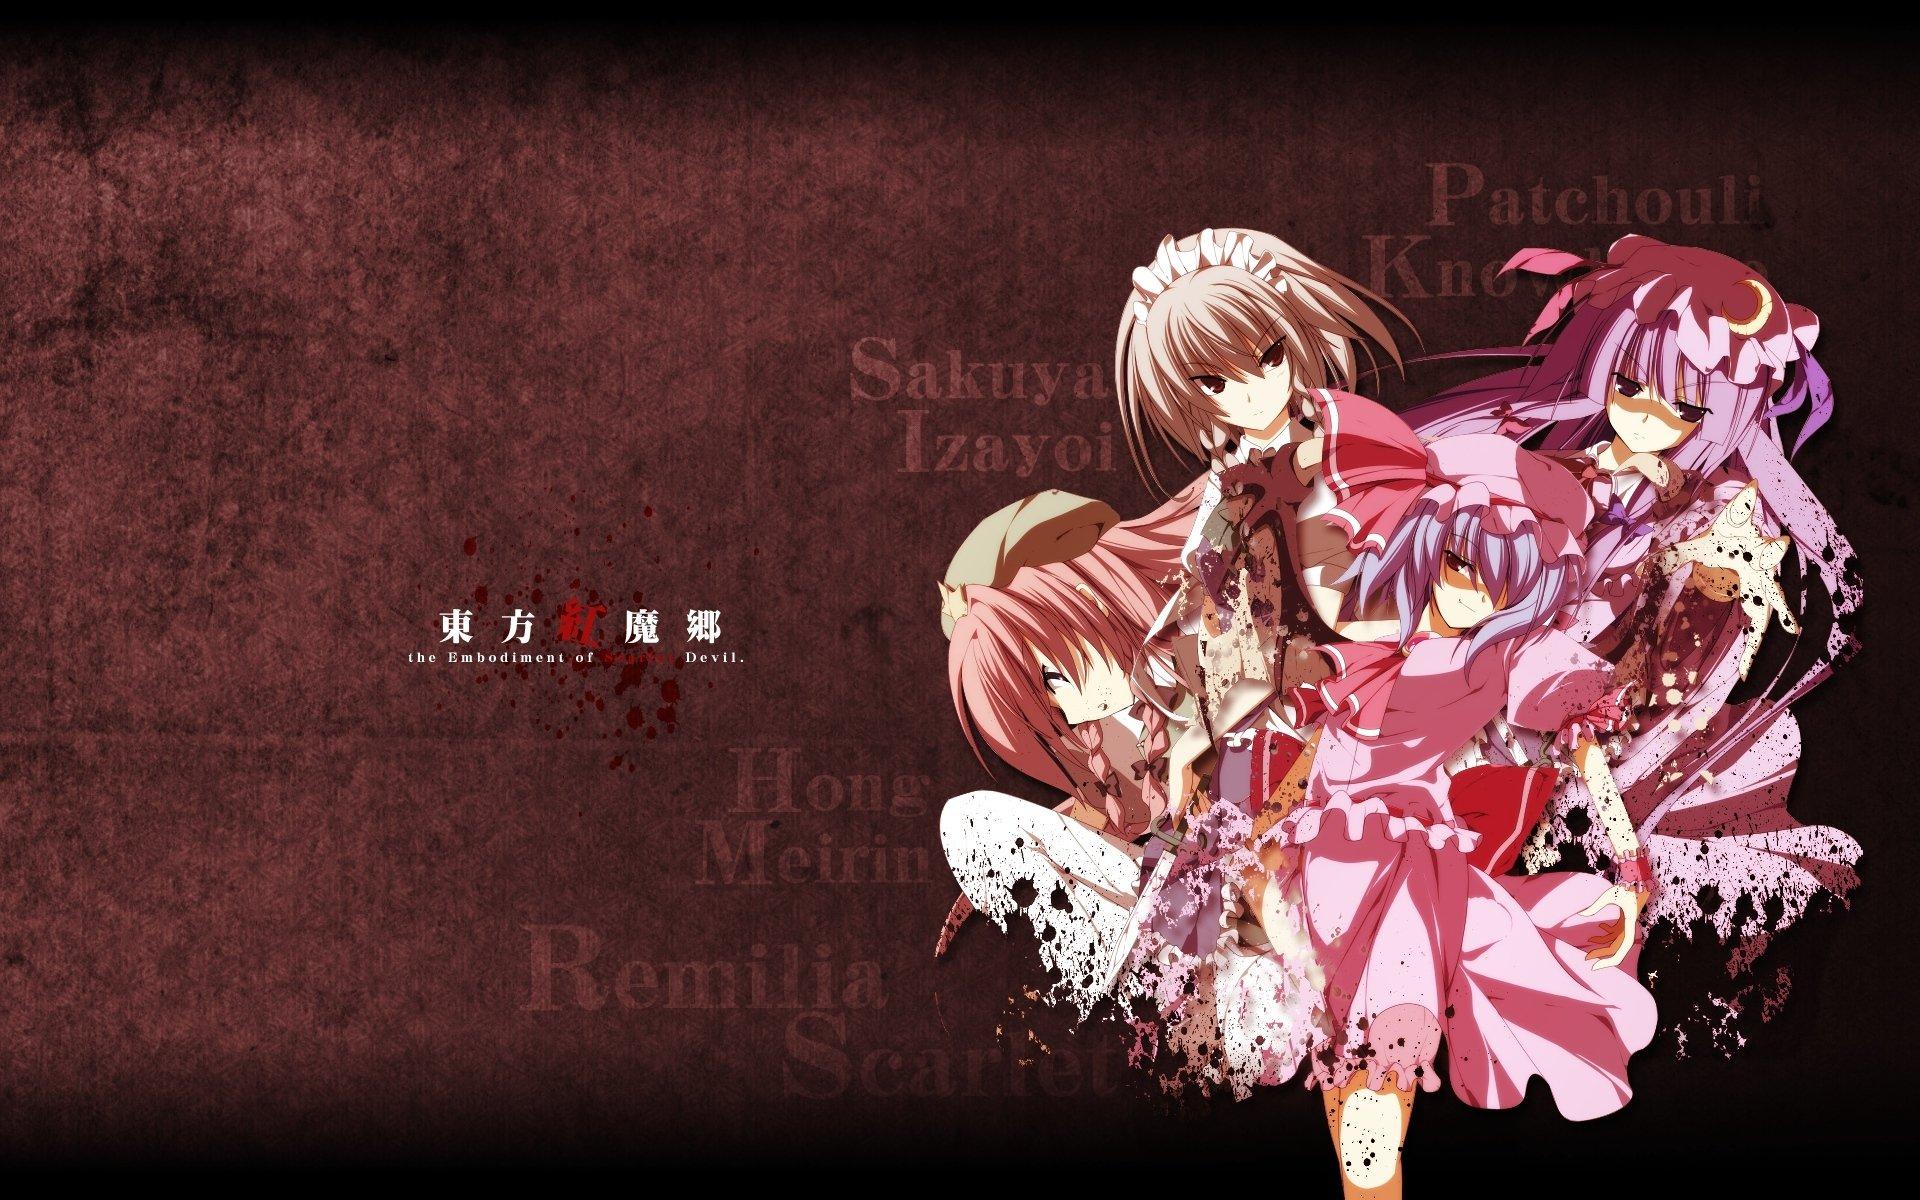 Anime - Touhou  Patchouli Knowledge Hong Meiling Sakuya Izayoi Remilia Scarlet Wallpaper